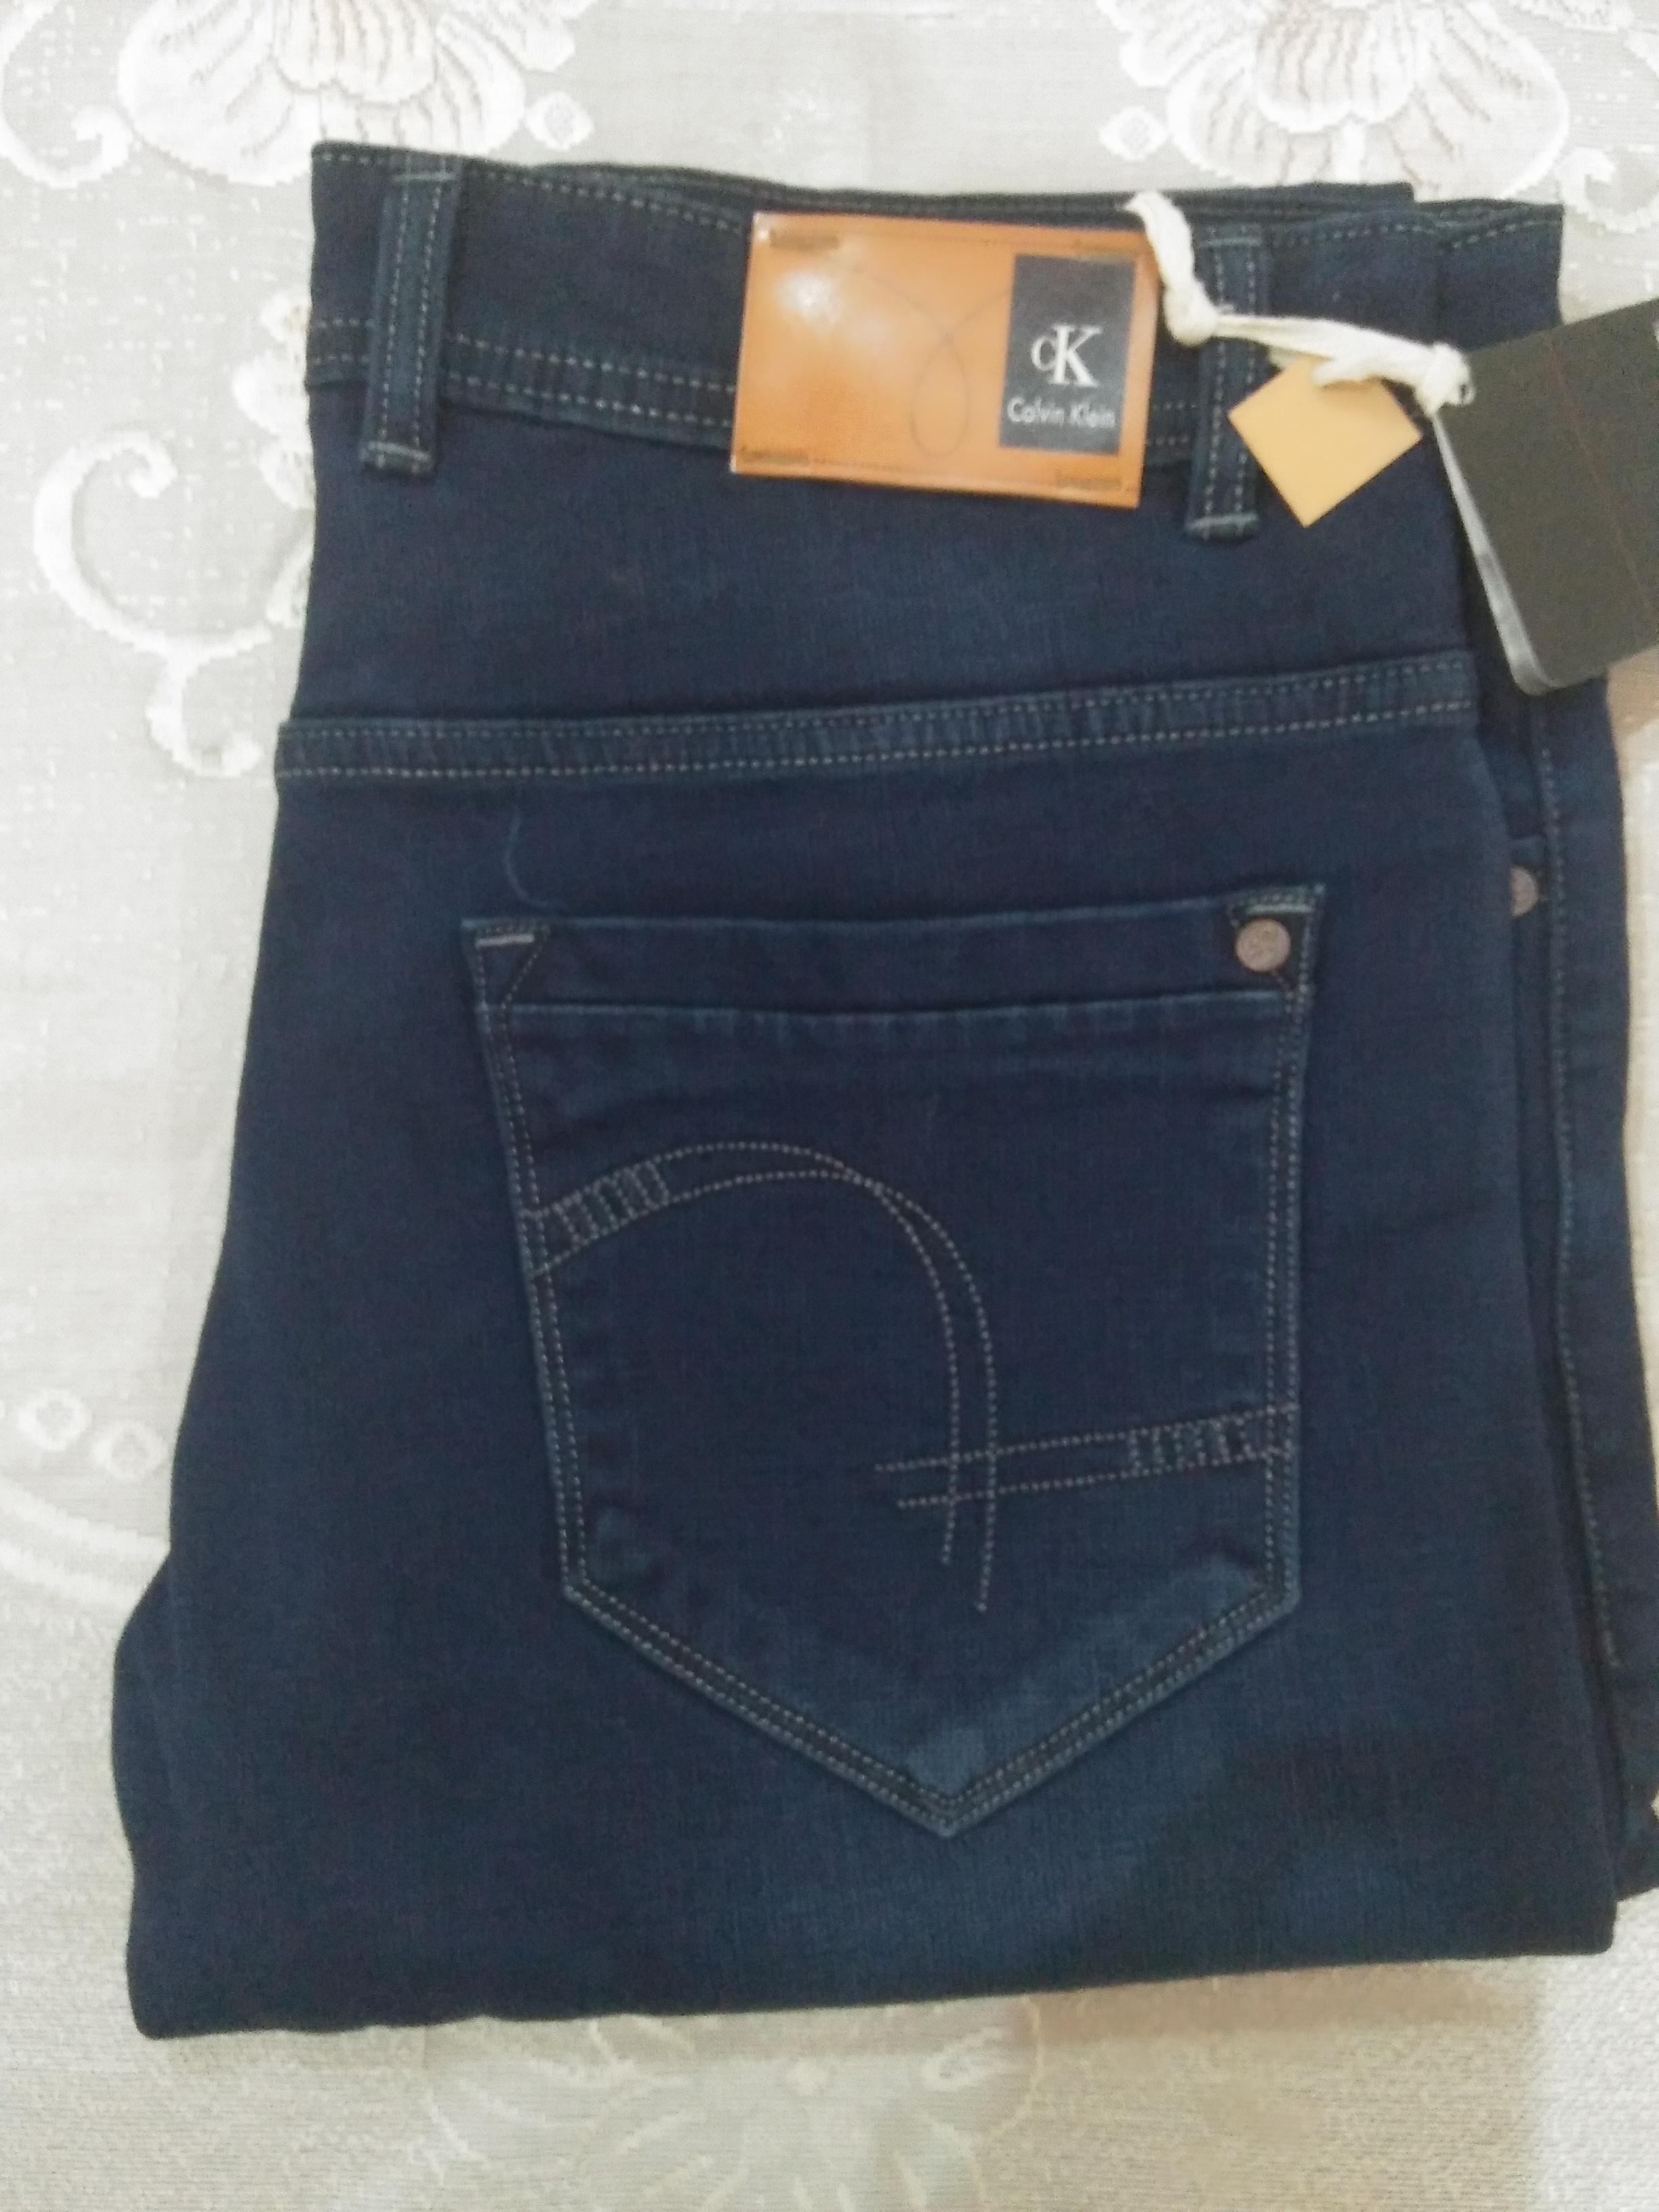 Gents jeans